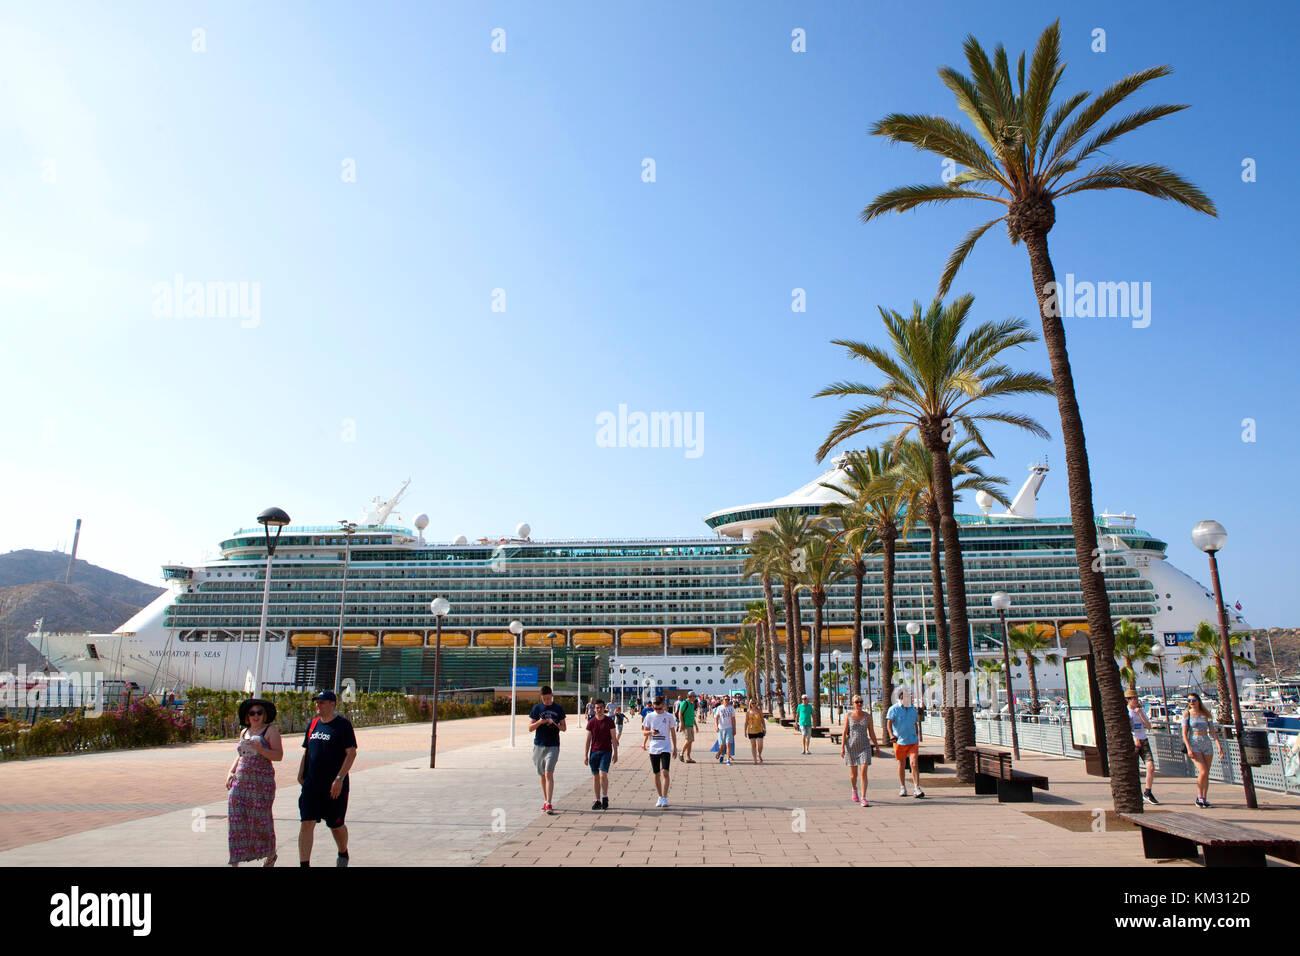 Royal Caribbean Navigator of the Seas cruise ship berthed at Cartagena city in Spain - Stock Image